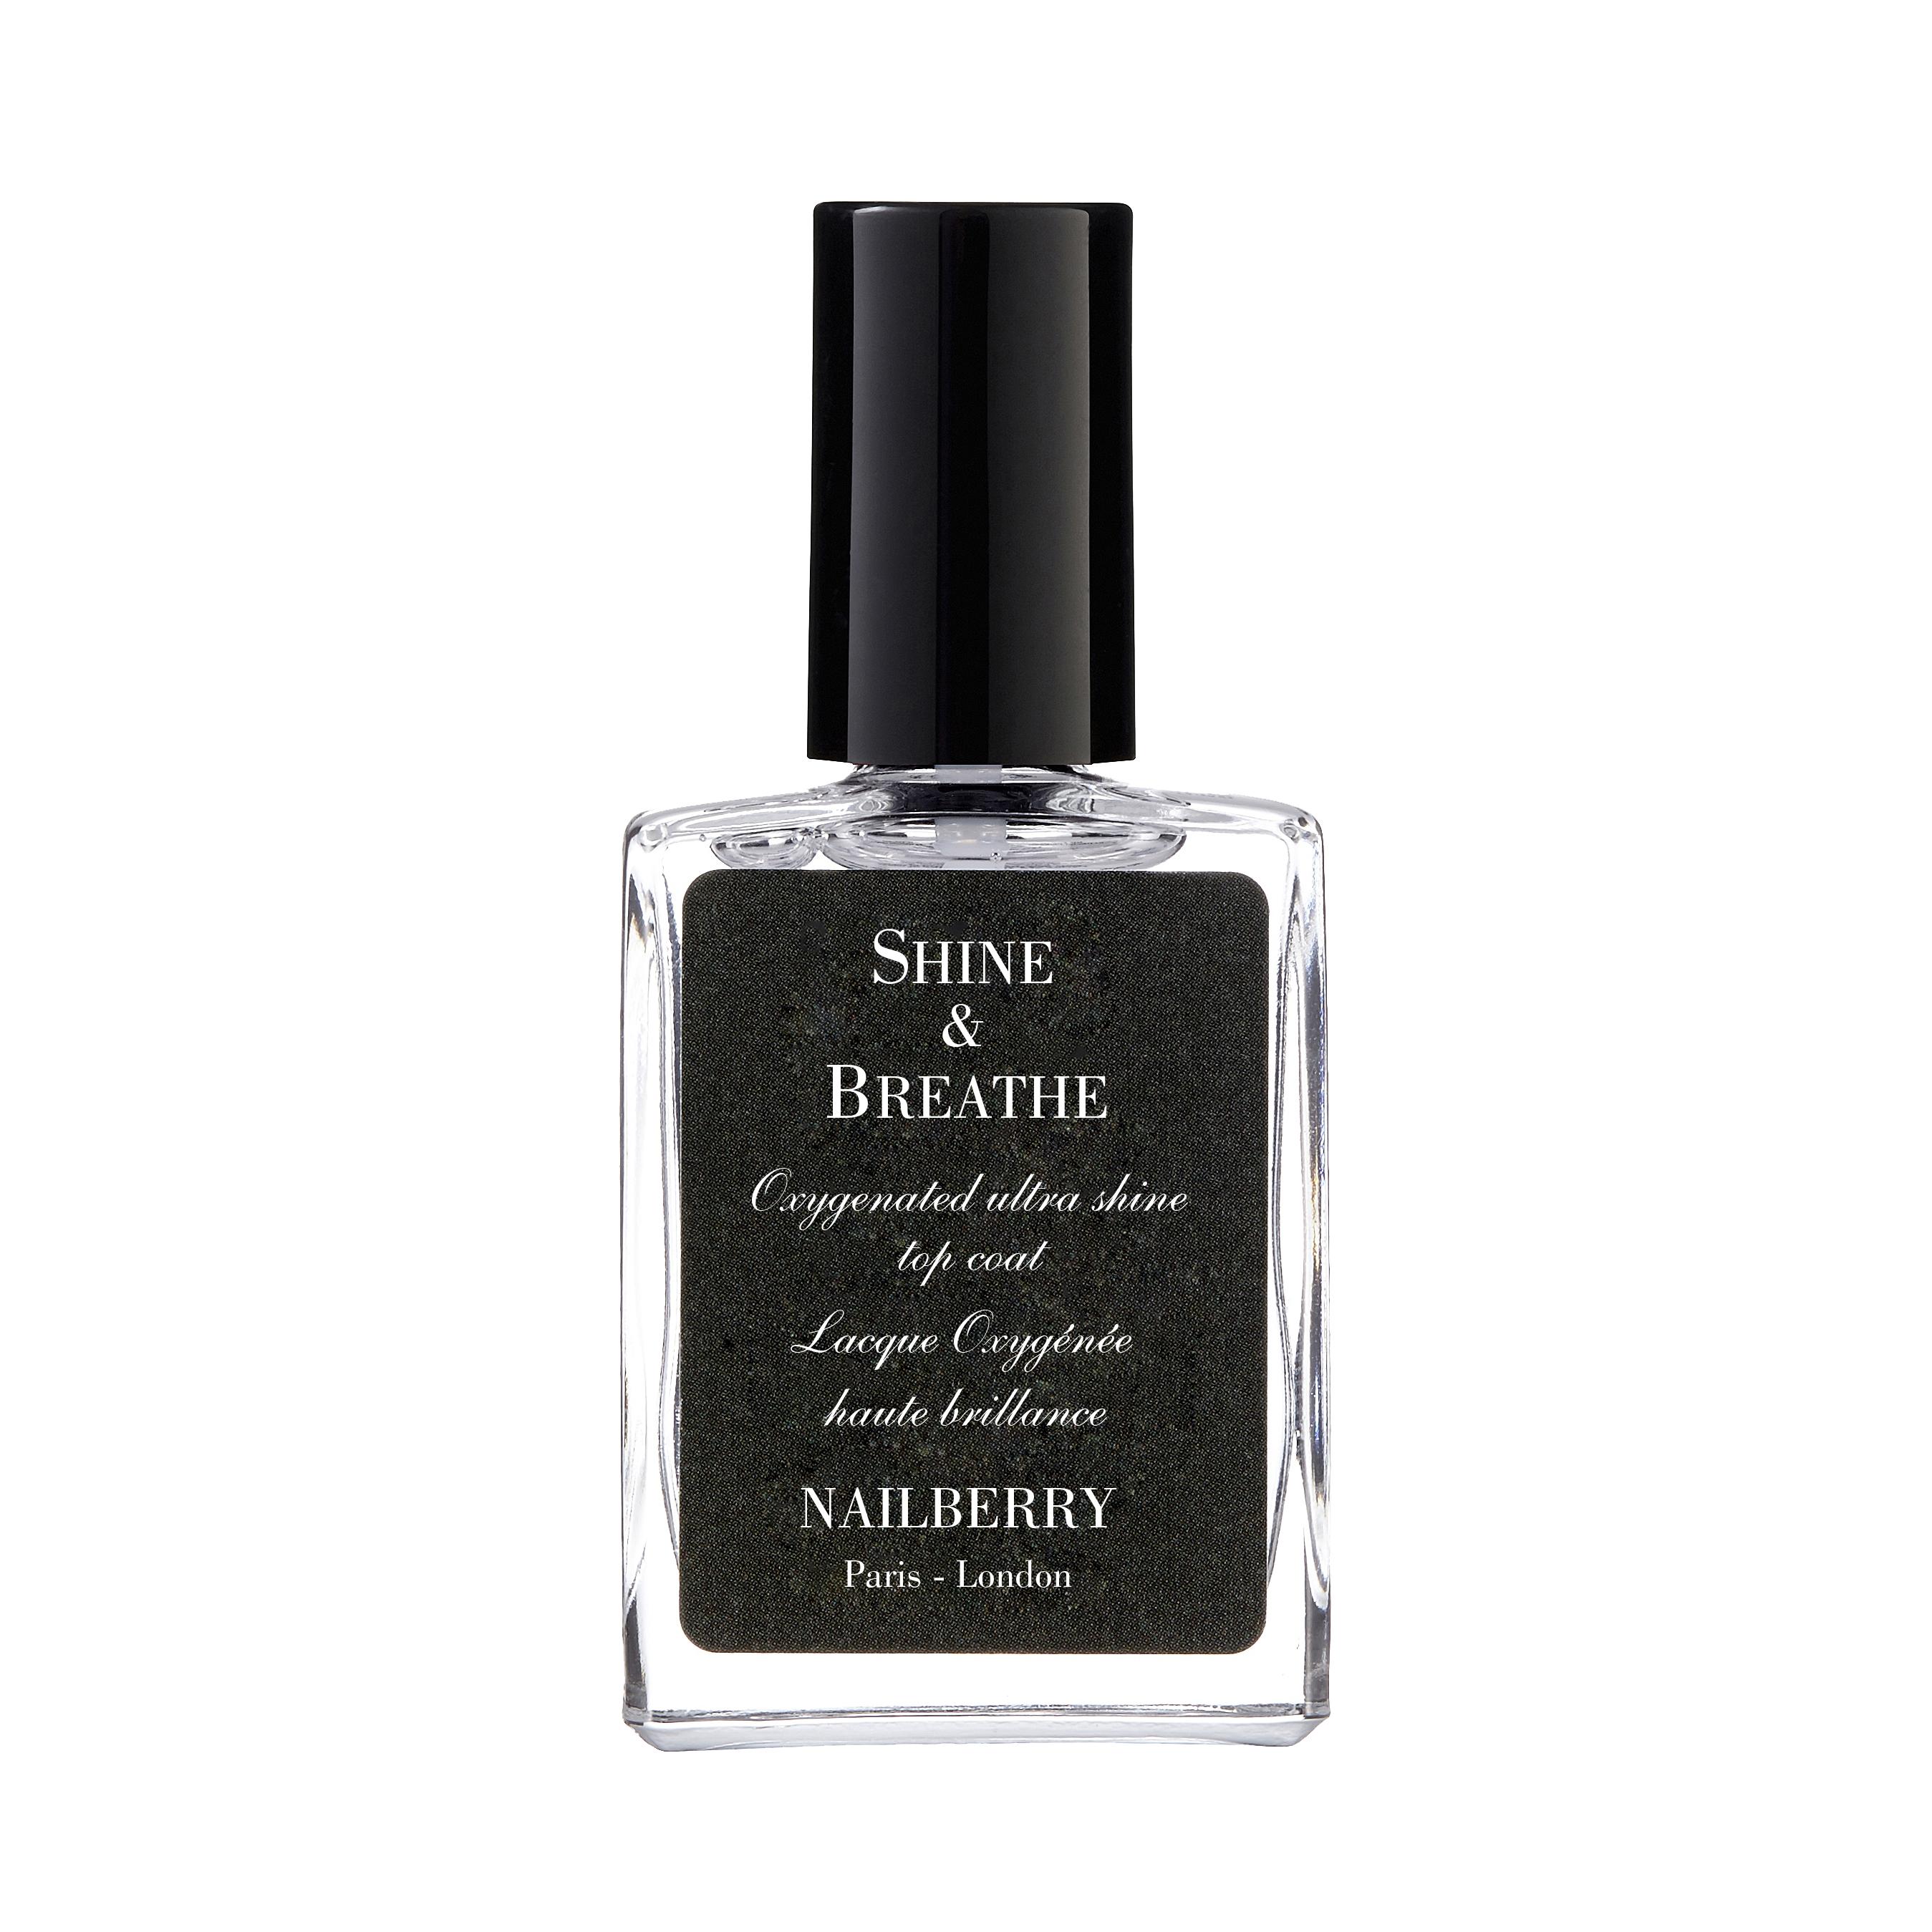 Nailberry Shine & Breathe, 15 ml